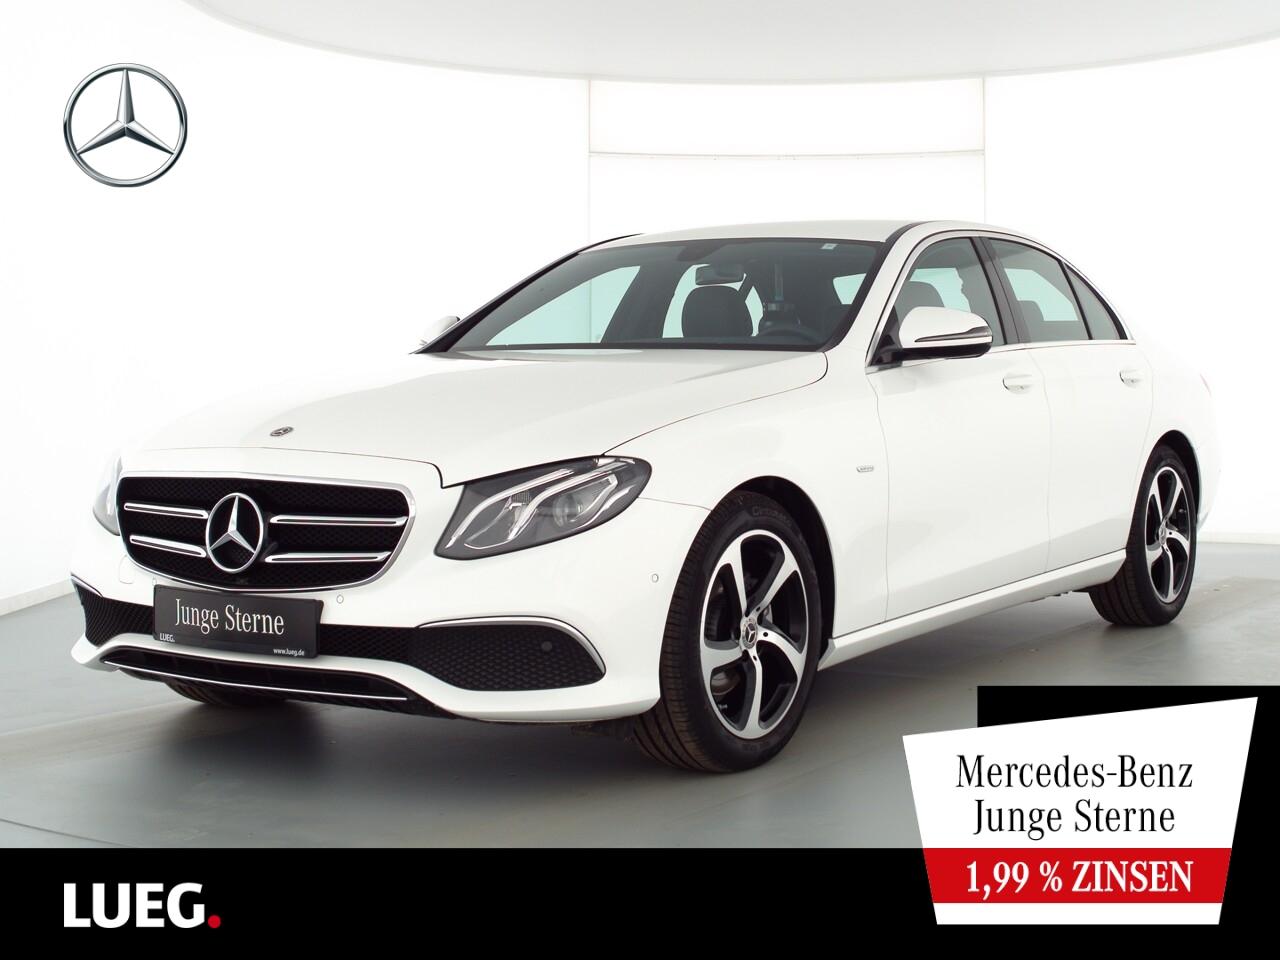 Mercedes-Benz E 200 d Avantgarde+Navi+LED-HP+SPORTSTYLE+Kamera, Jahr 2020, Diesel